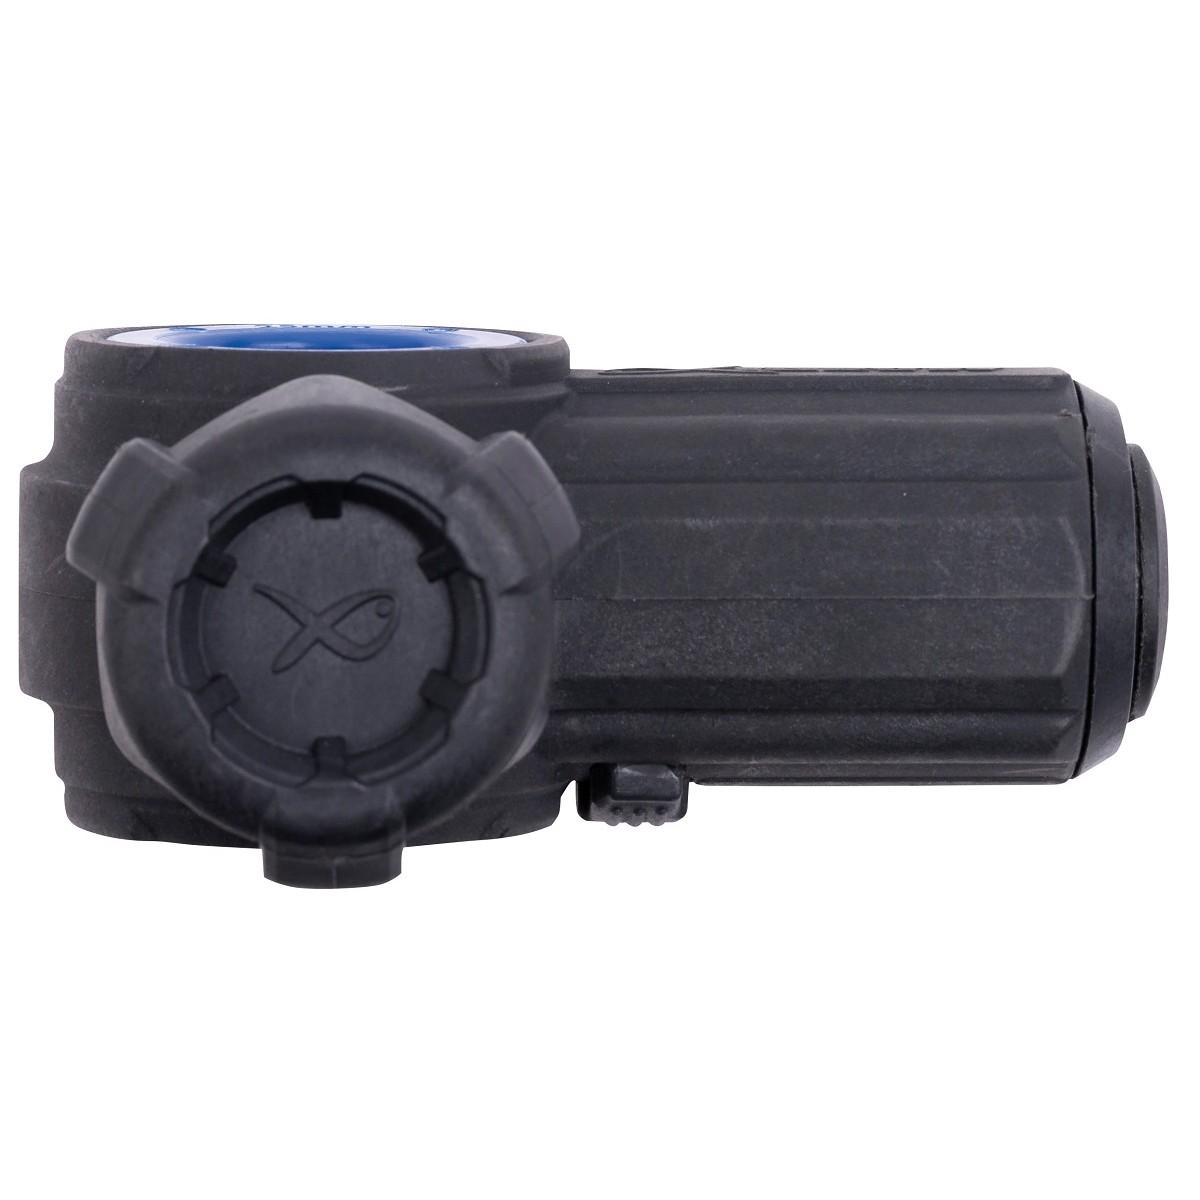 Прикачна за платформа Matrix 3D-R Keepnet Arm Short - държач за живарник